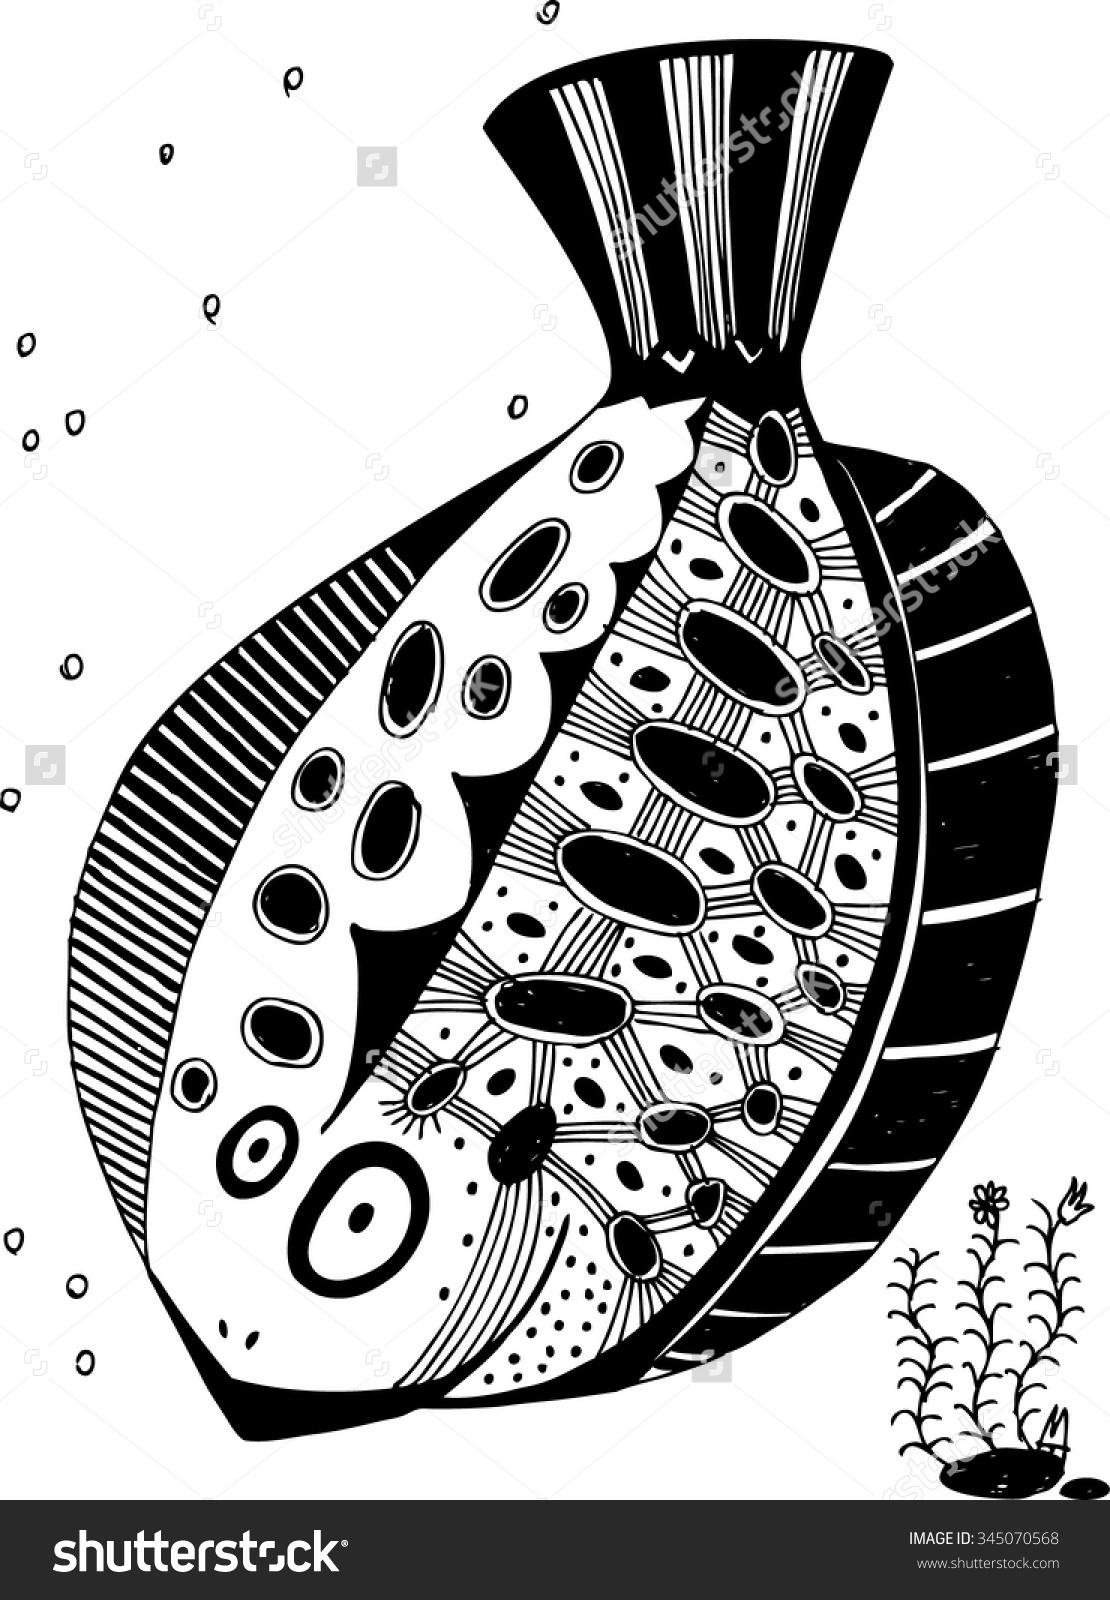 Vector Illustration Hand Drawn Fish Seaweed Stock Vector 345070568.